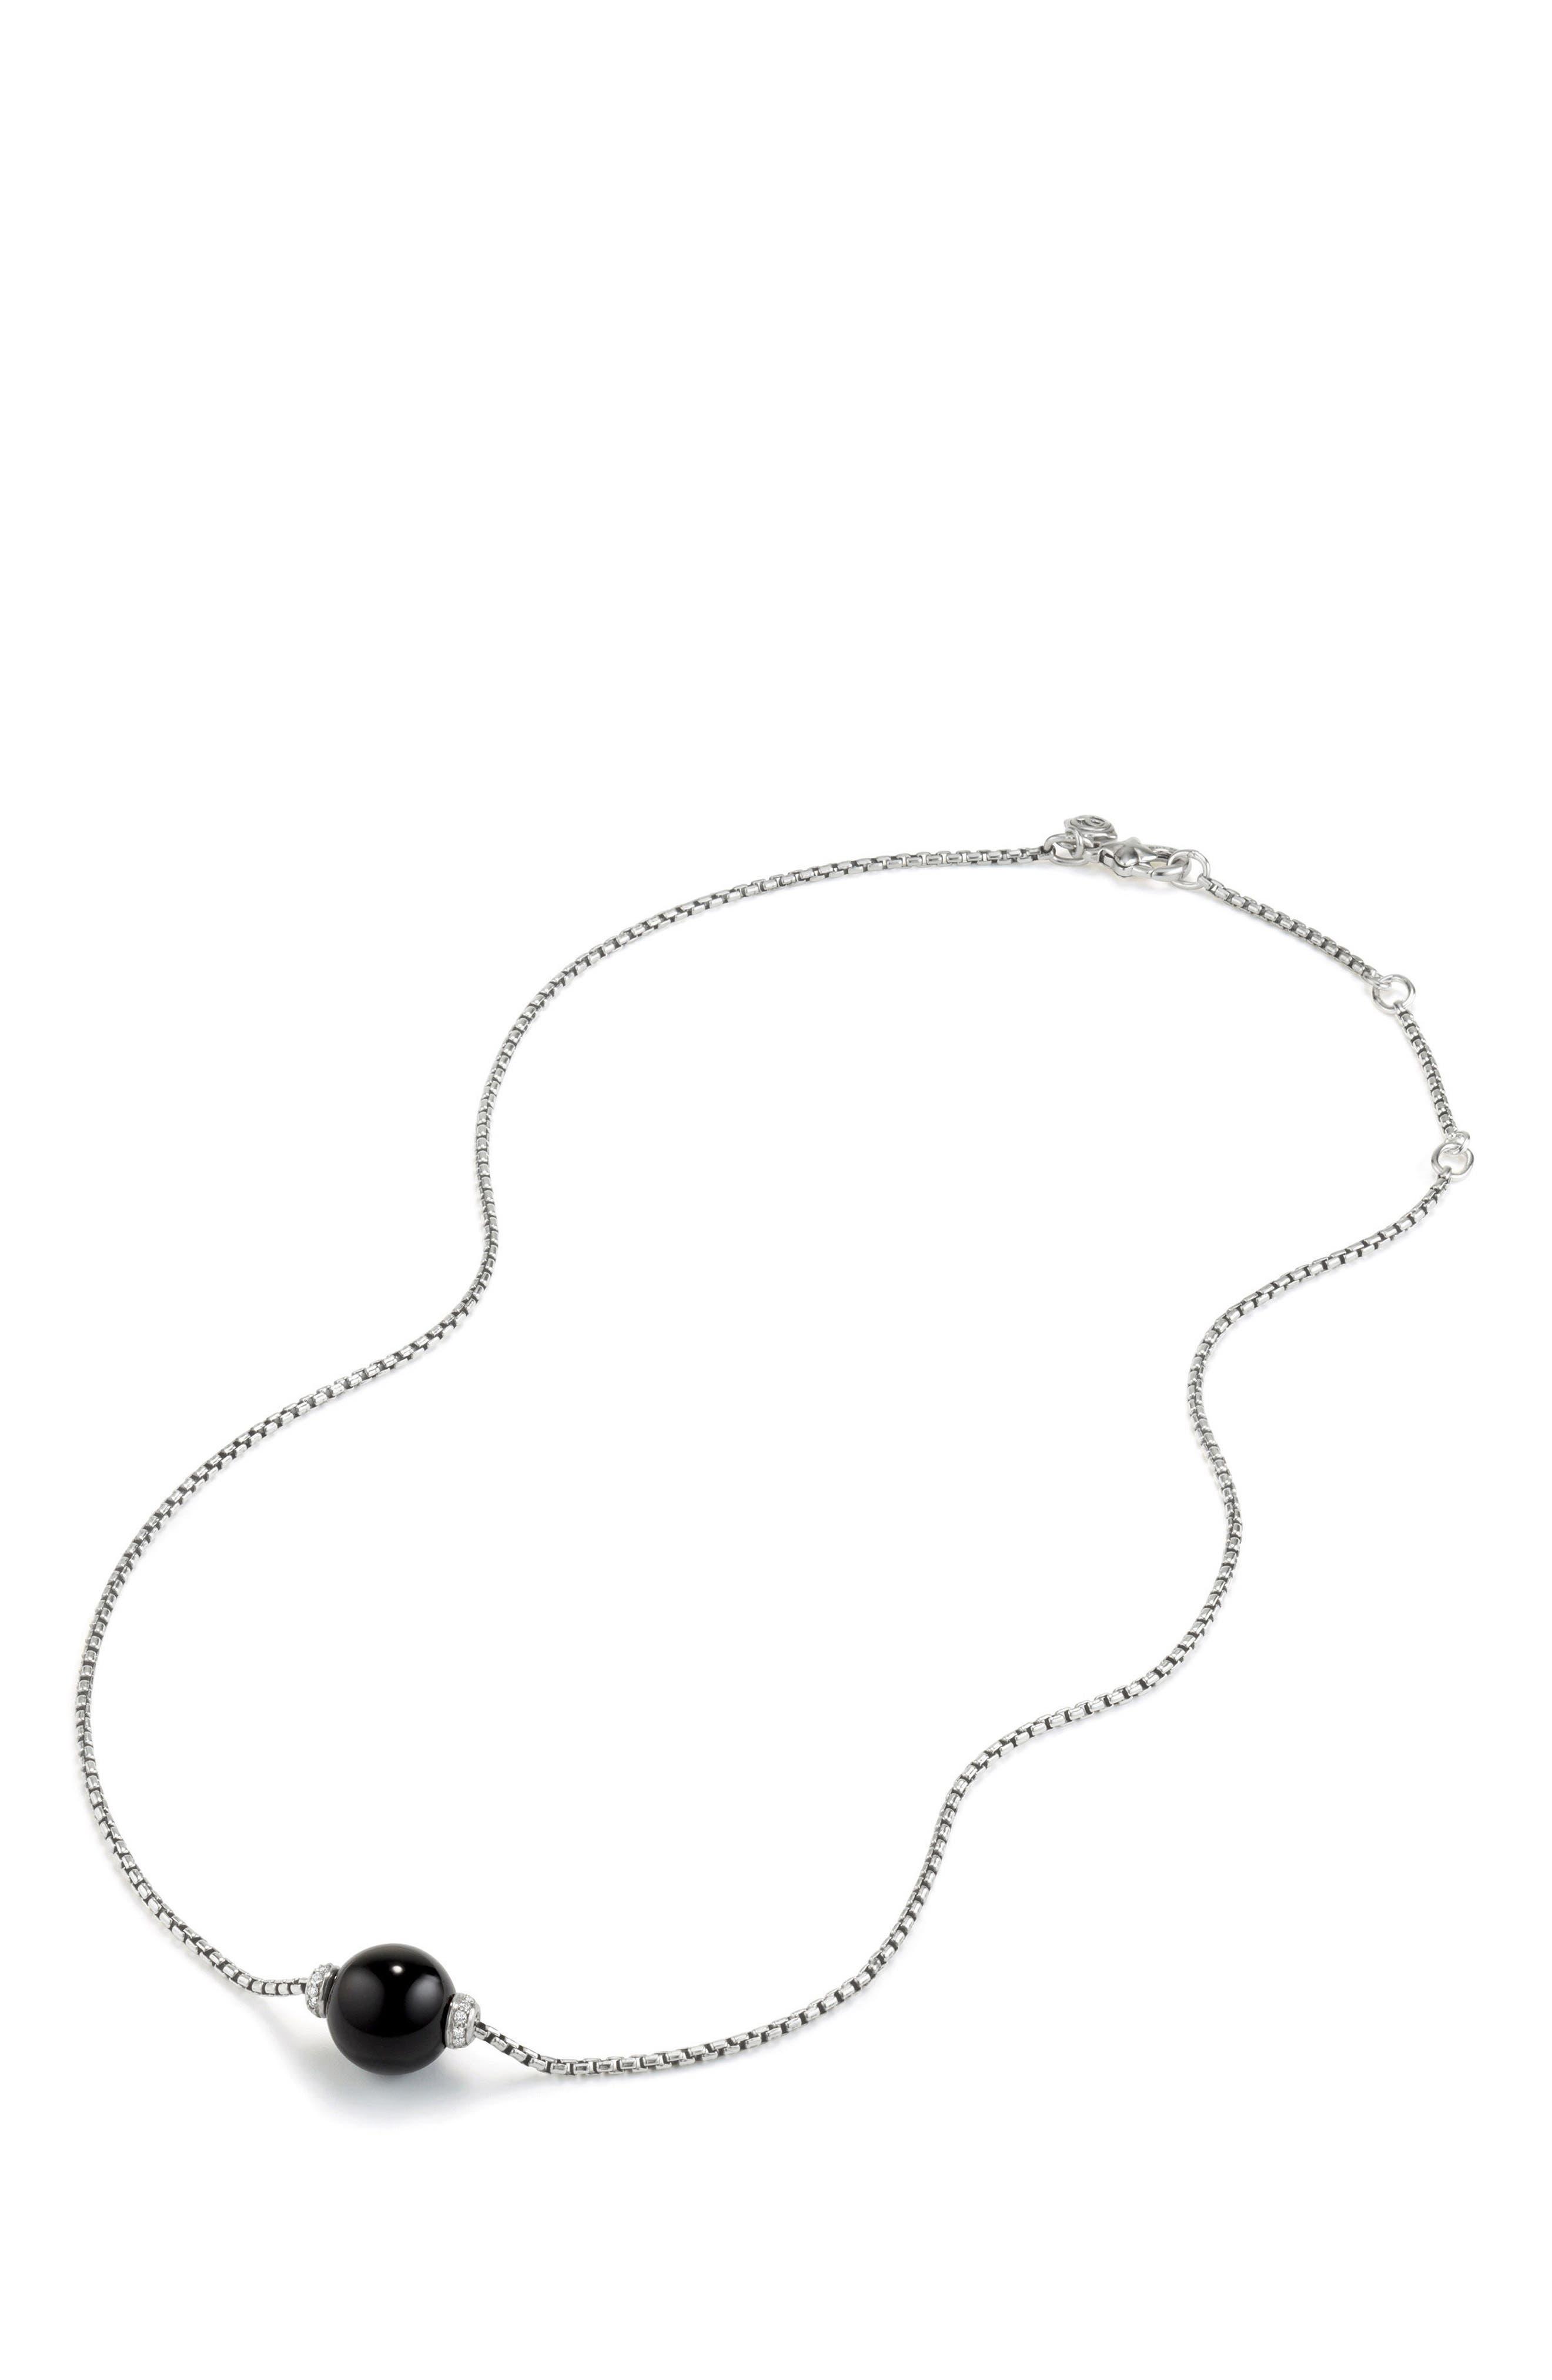 Solari Pendant Necklace with Diamonds,                             Alternate thumbnail 2, color,                             SILVER/ DIAMOND/ BLACK ONYX